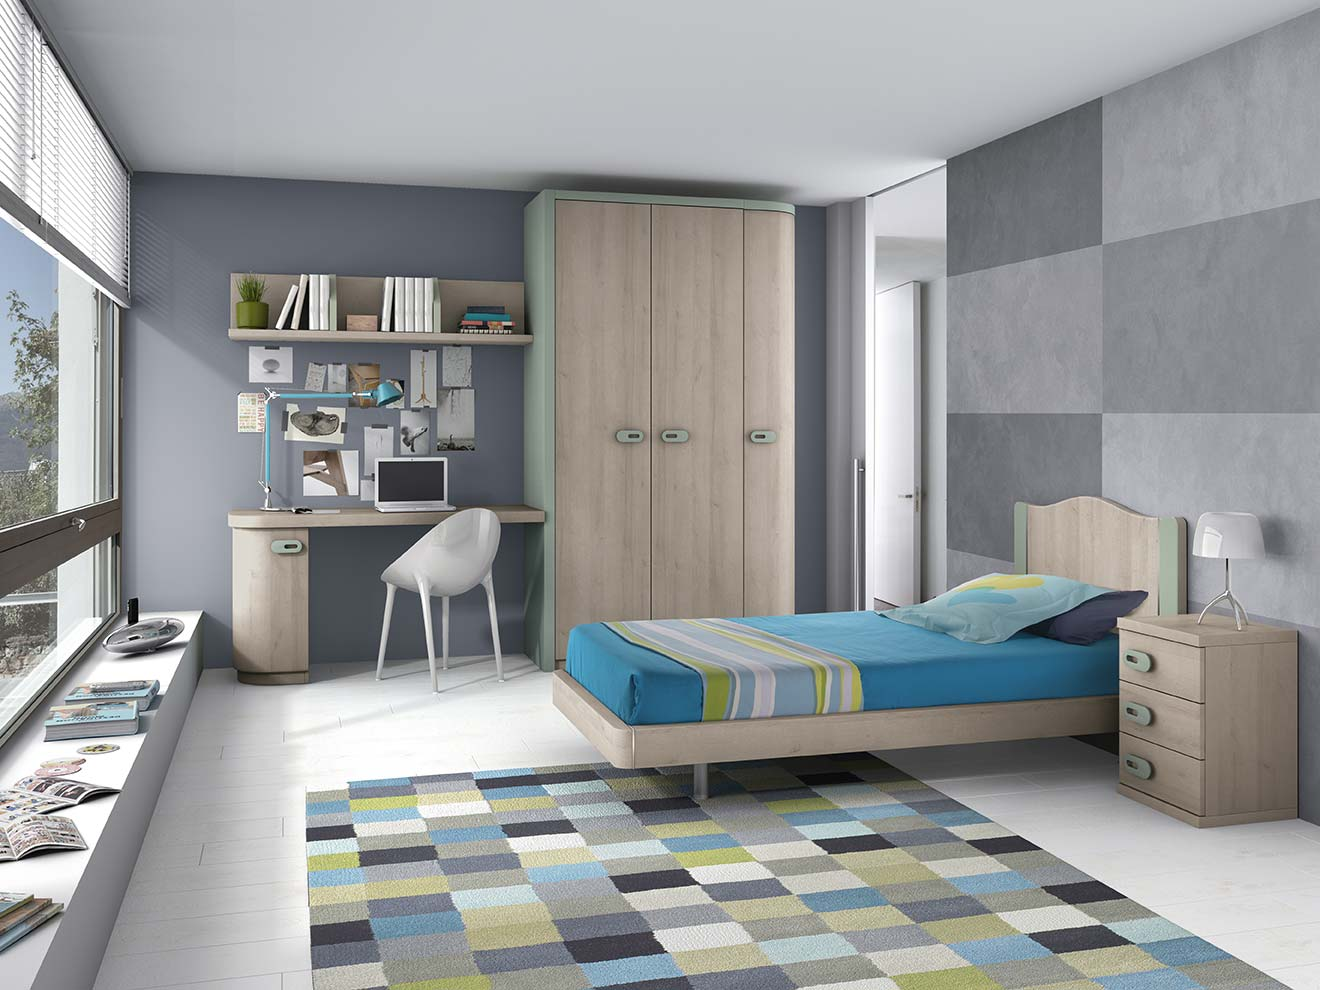 Juveniles muebles jp for Disenar dormitorio juvenil 3d